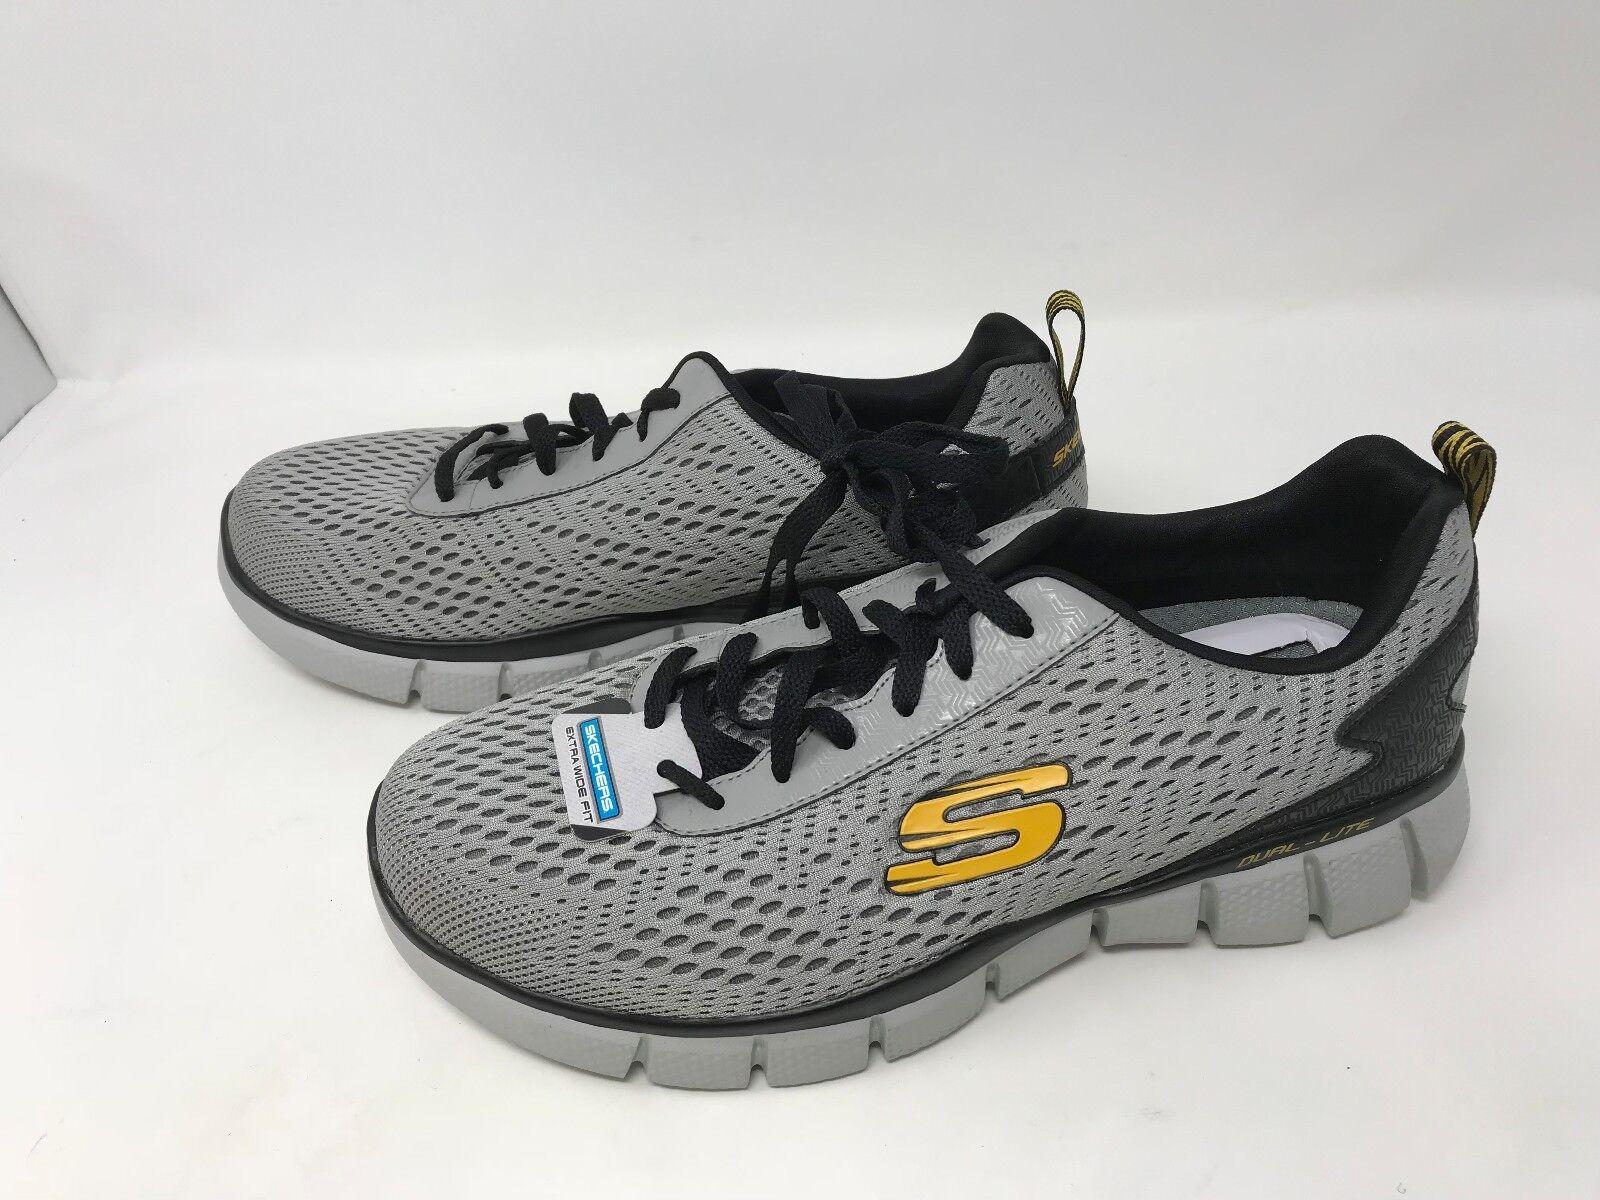 Men's Skechers (51529) EQUALIZER 2.0 SETTLE THE SCORE training sneakers   16N